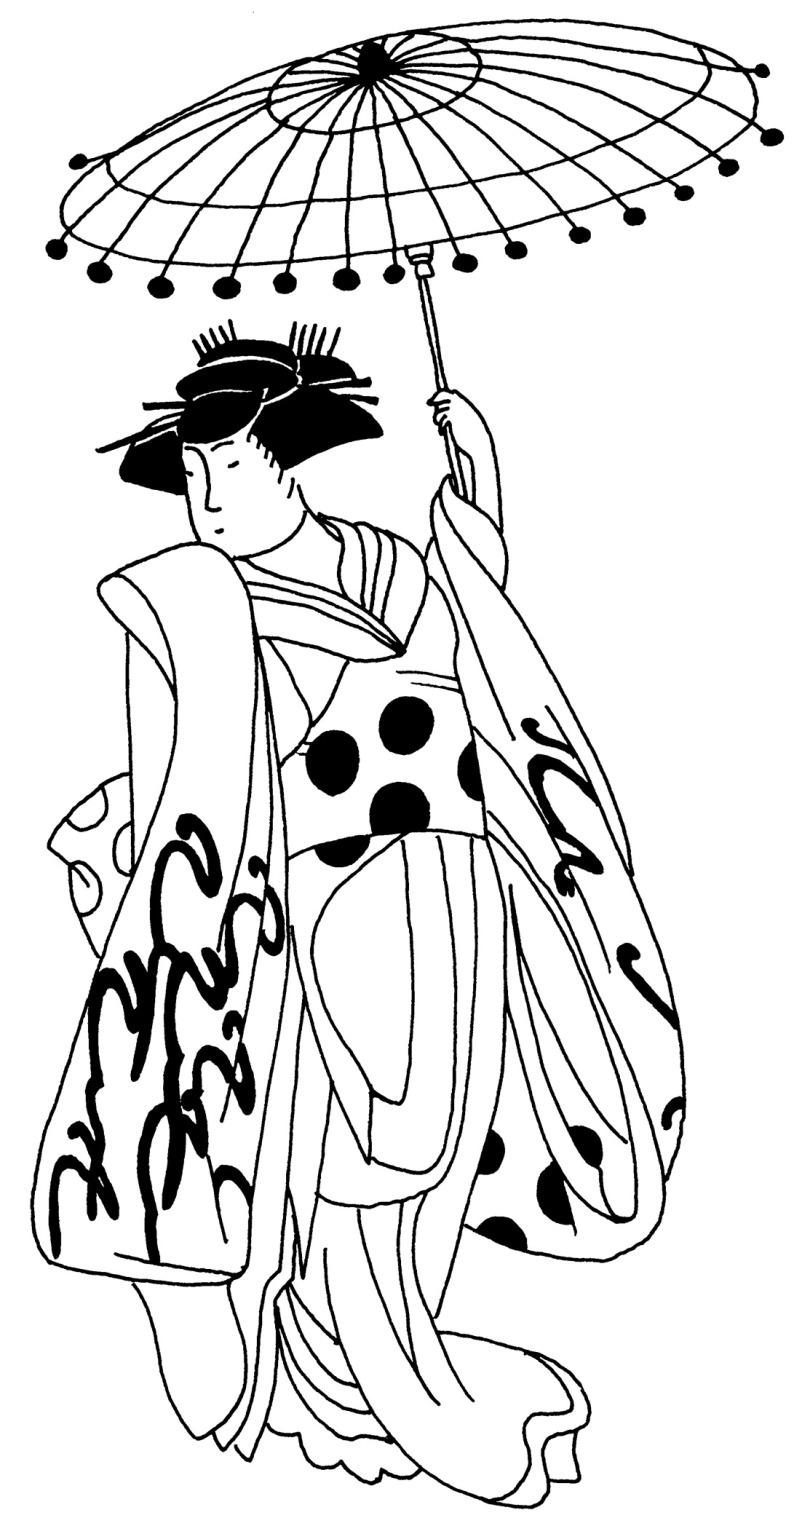 Geisha with umbrella tattoo design